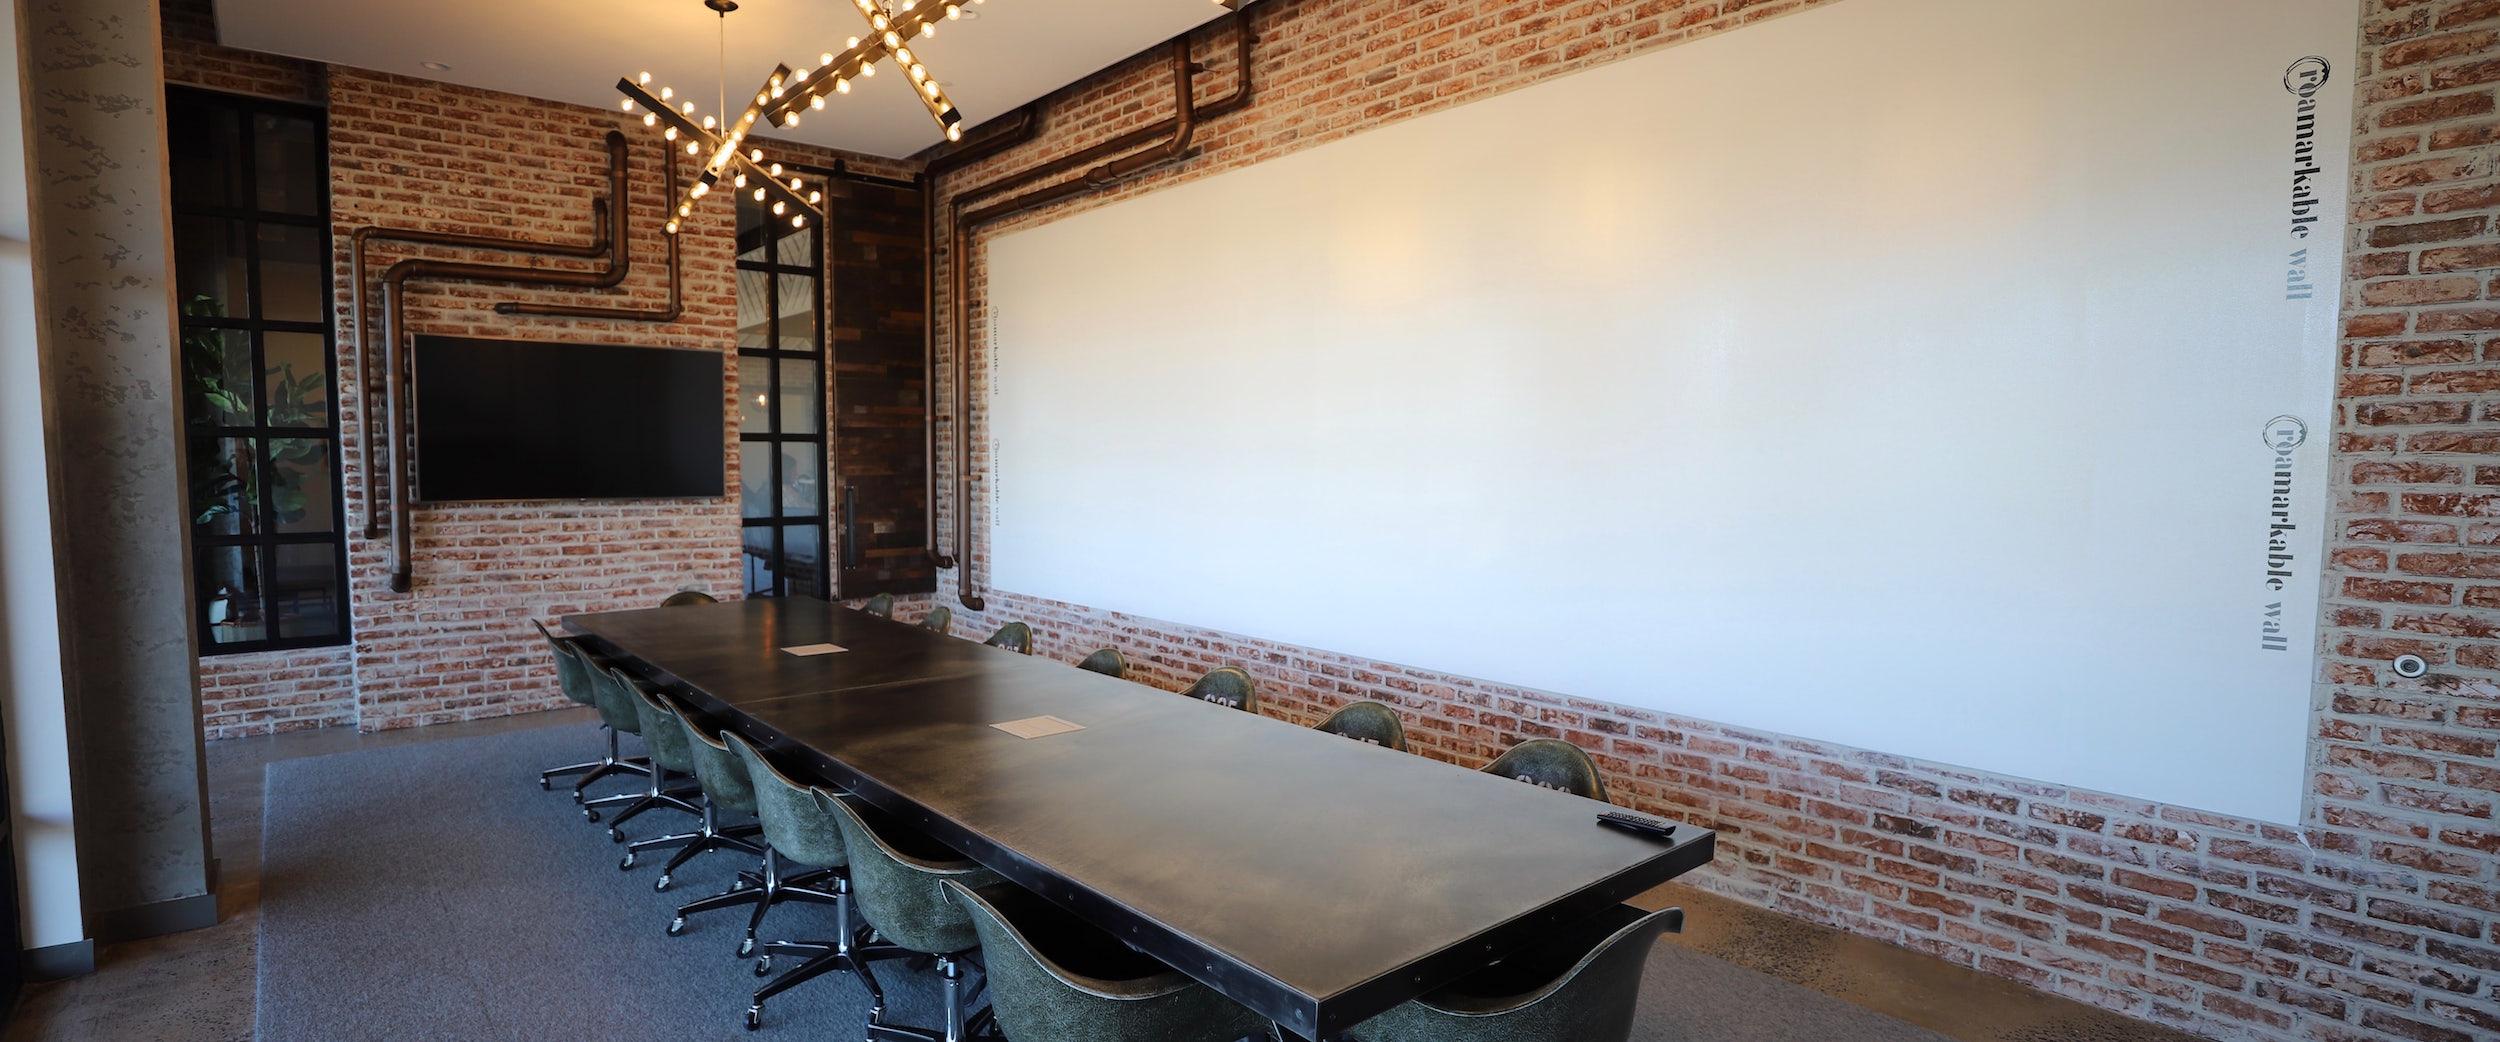 Factory board room at Roam Perimeter Center